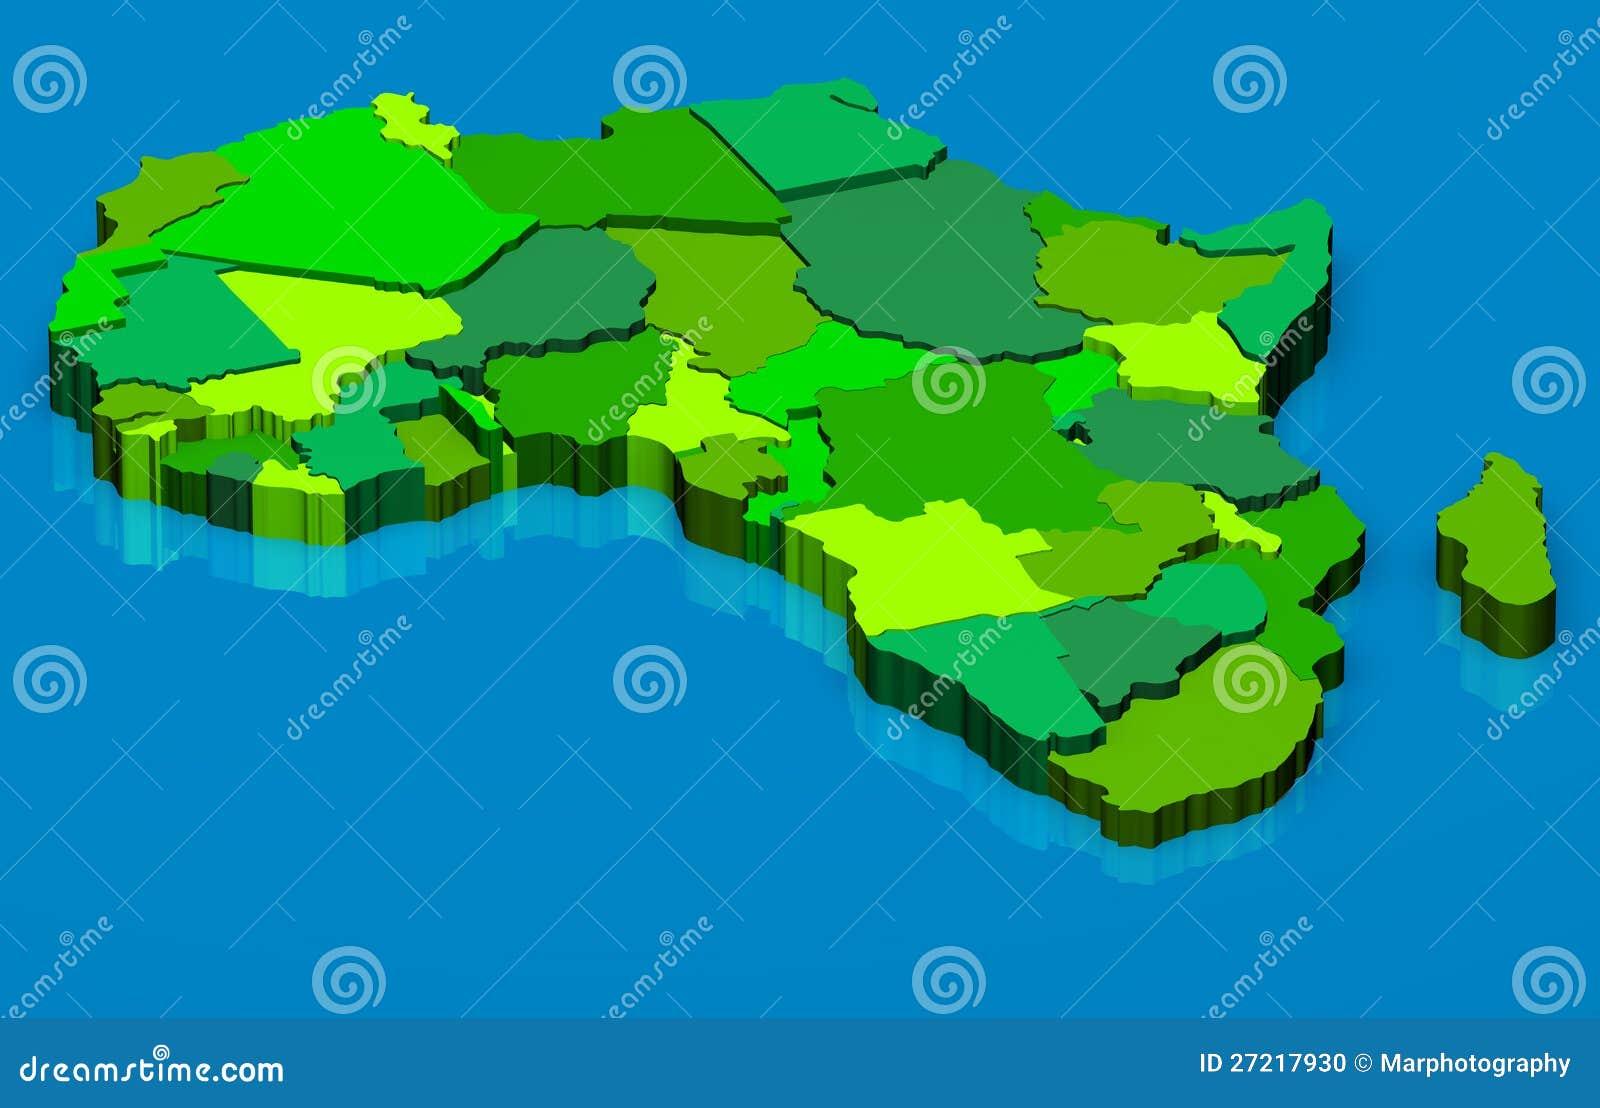 Political map of Africa 3D stock illustration. Illustration of